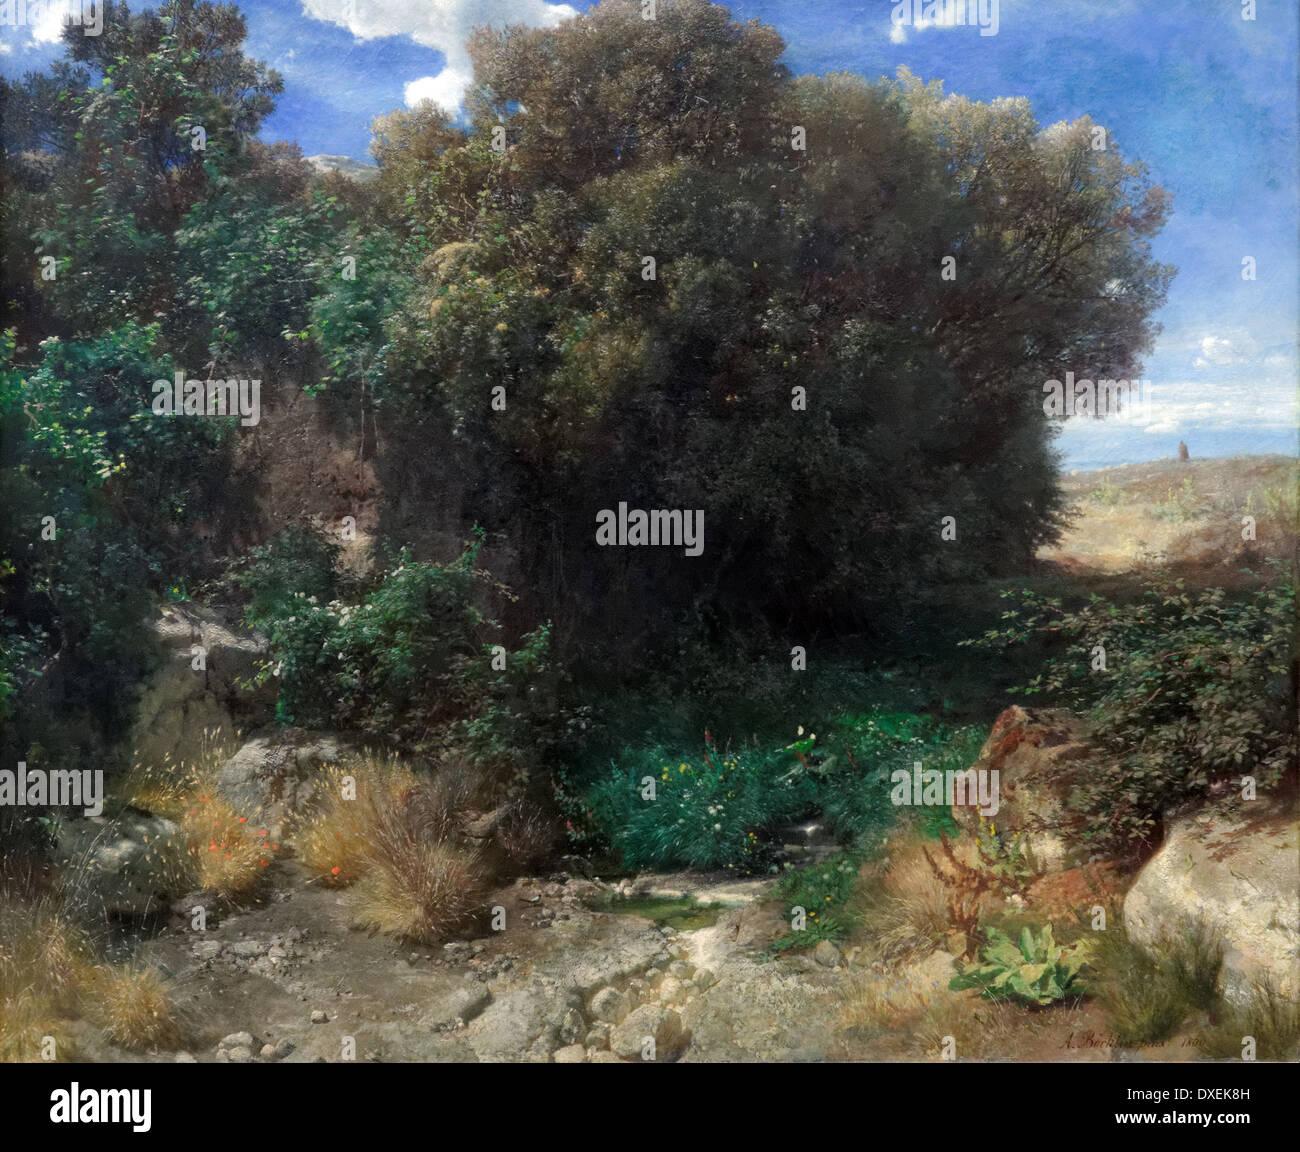 Arnold Bocklin - Campagna Landscape - 1859 - XIX th century - German school - Alte Nationalgalerie - Berlin - Stock Image